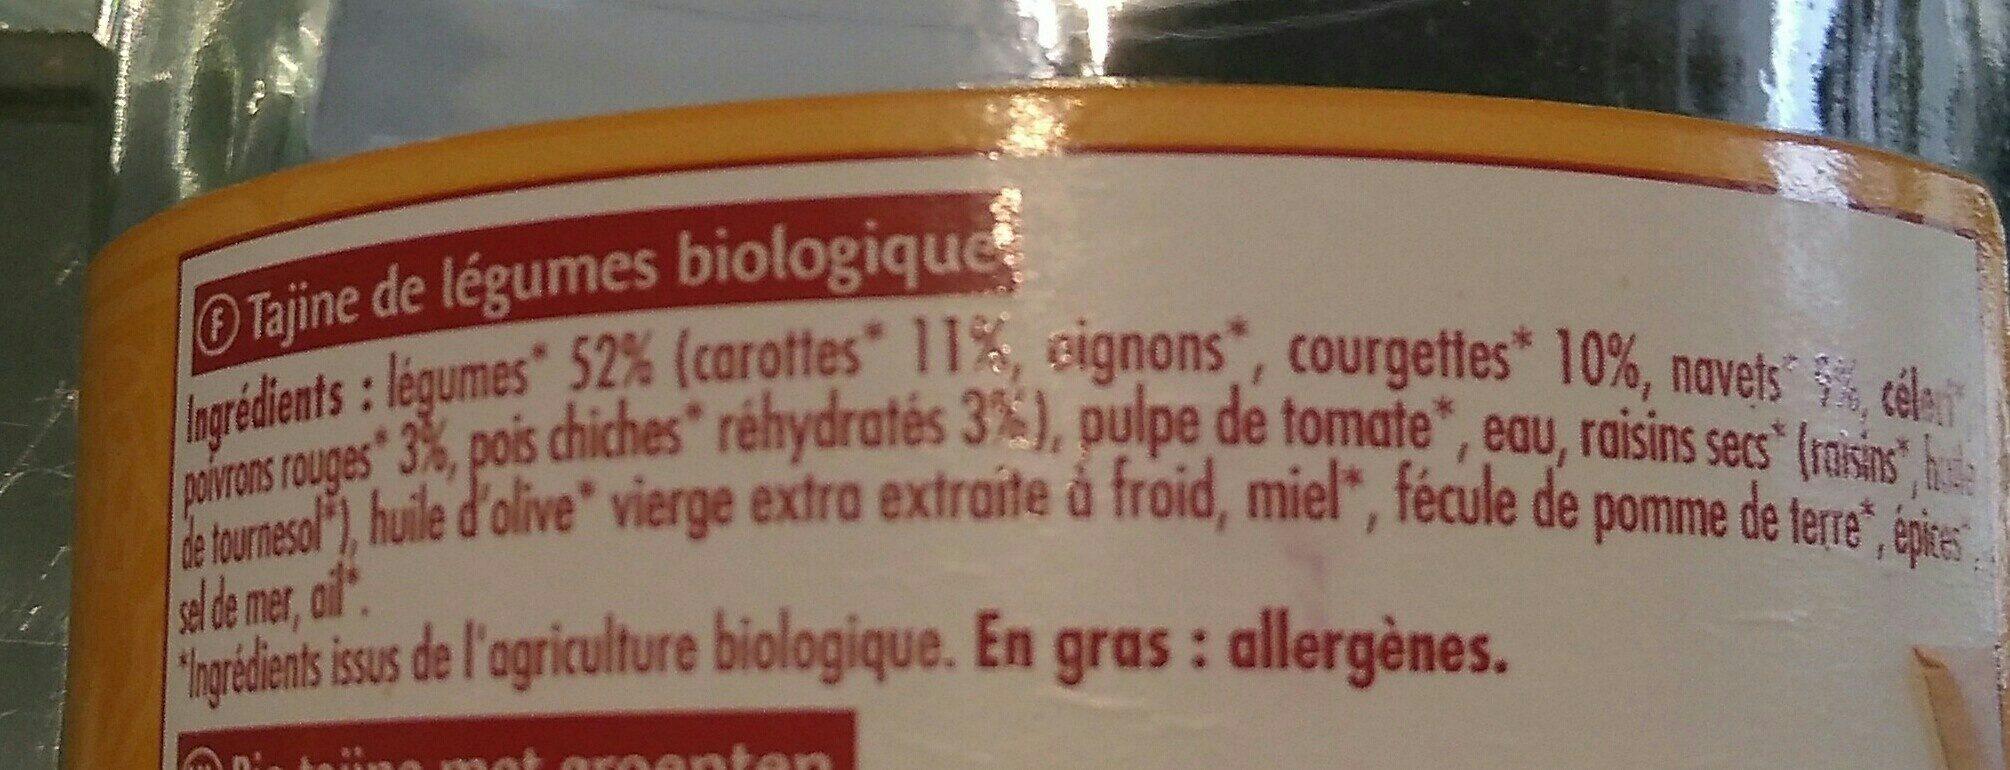 Tajine Aux 7 Legumes Du Soleil - Ingredients - fr